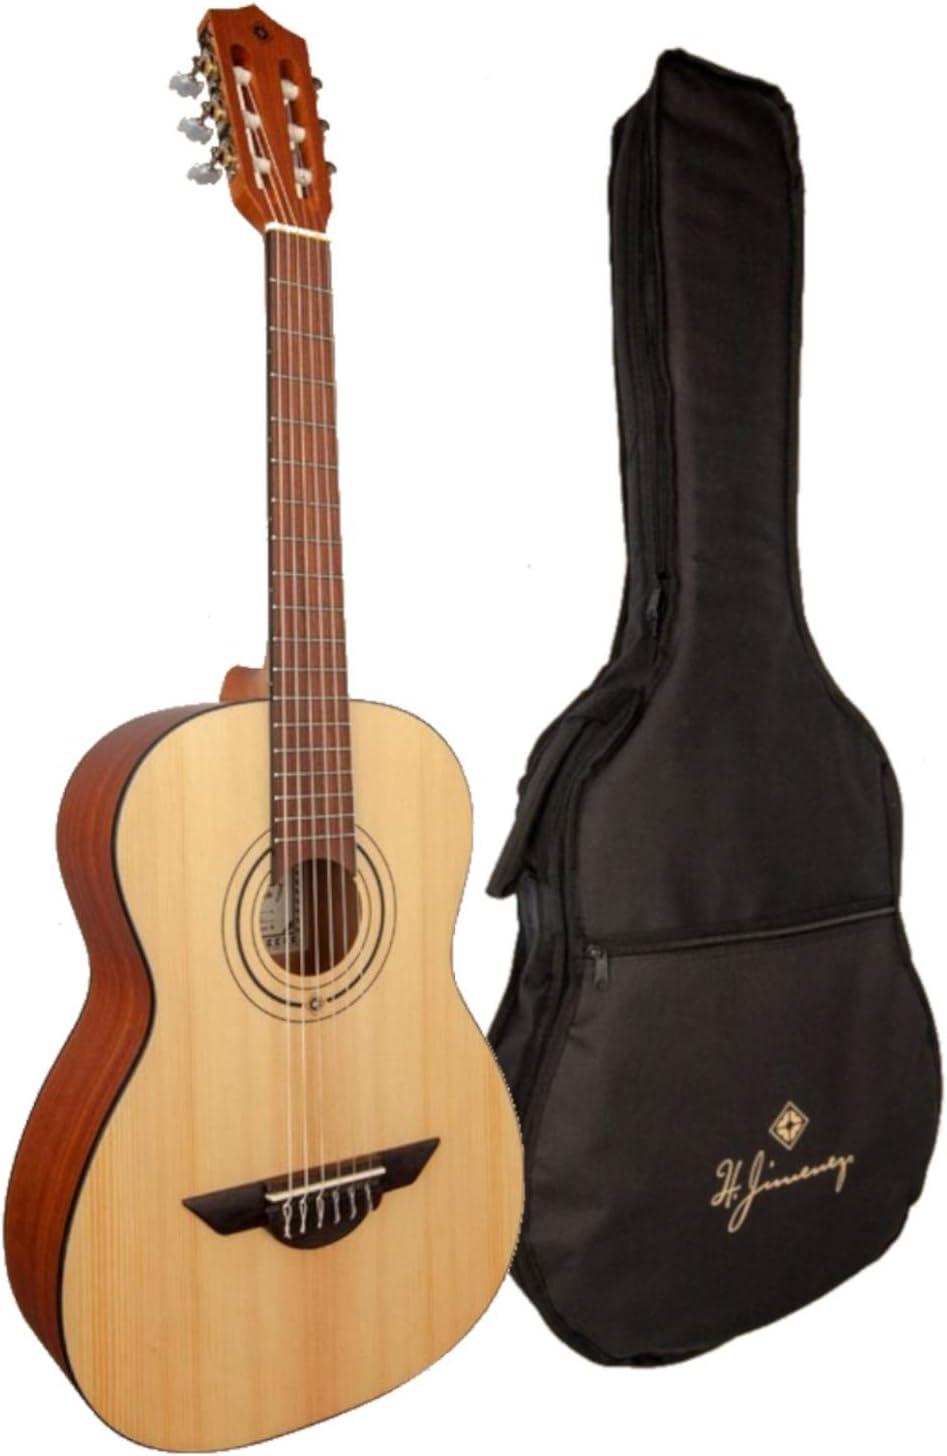 H. Import Jimenez Educativo LG75 3 4 Size National uniform free shipping Guitar Nylon String Classical